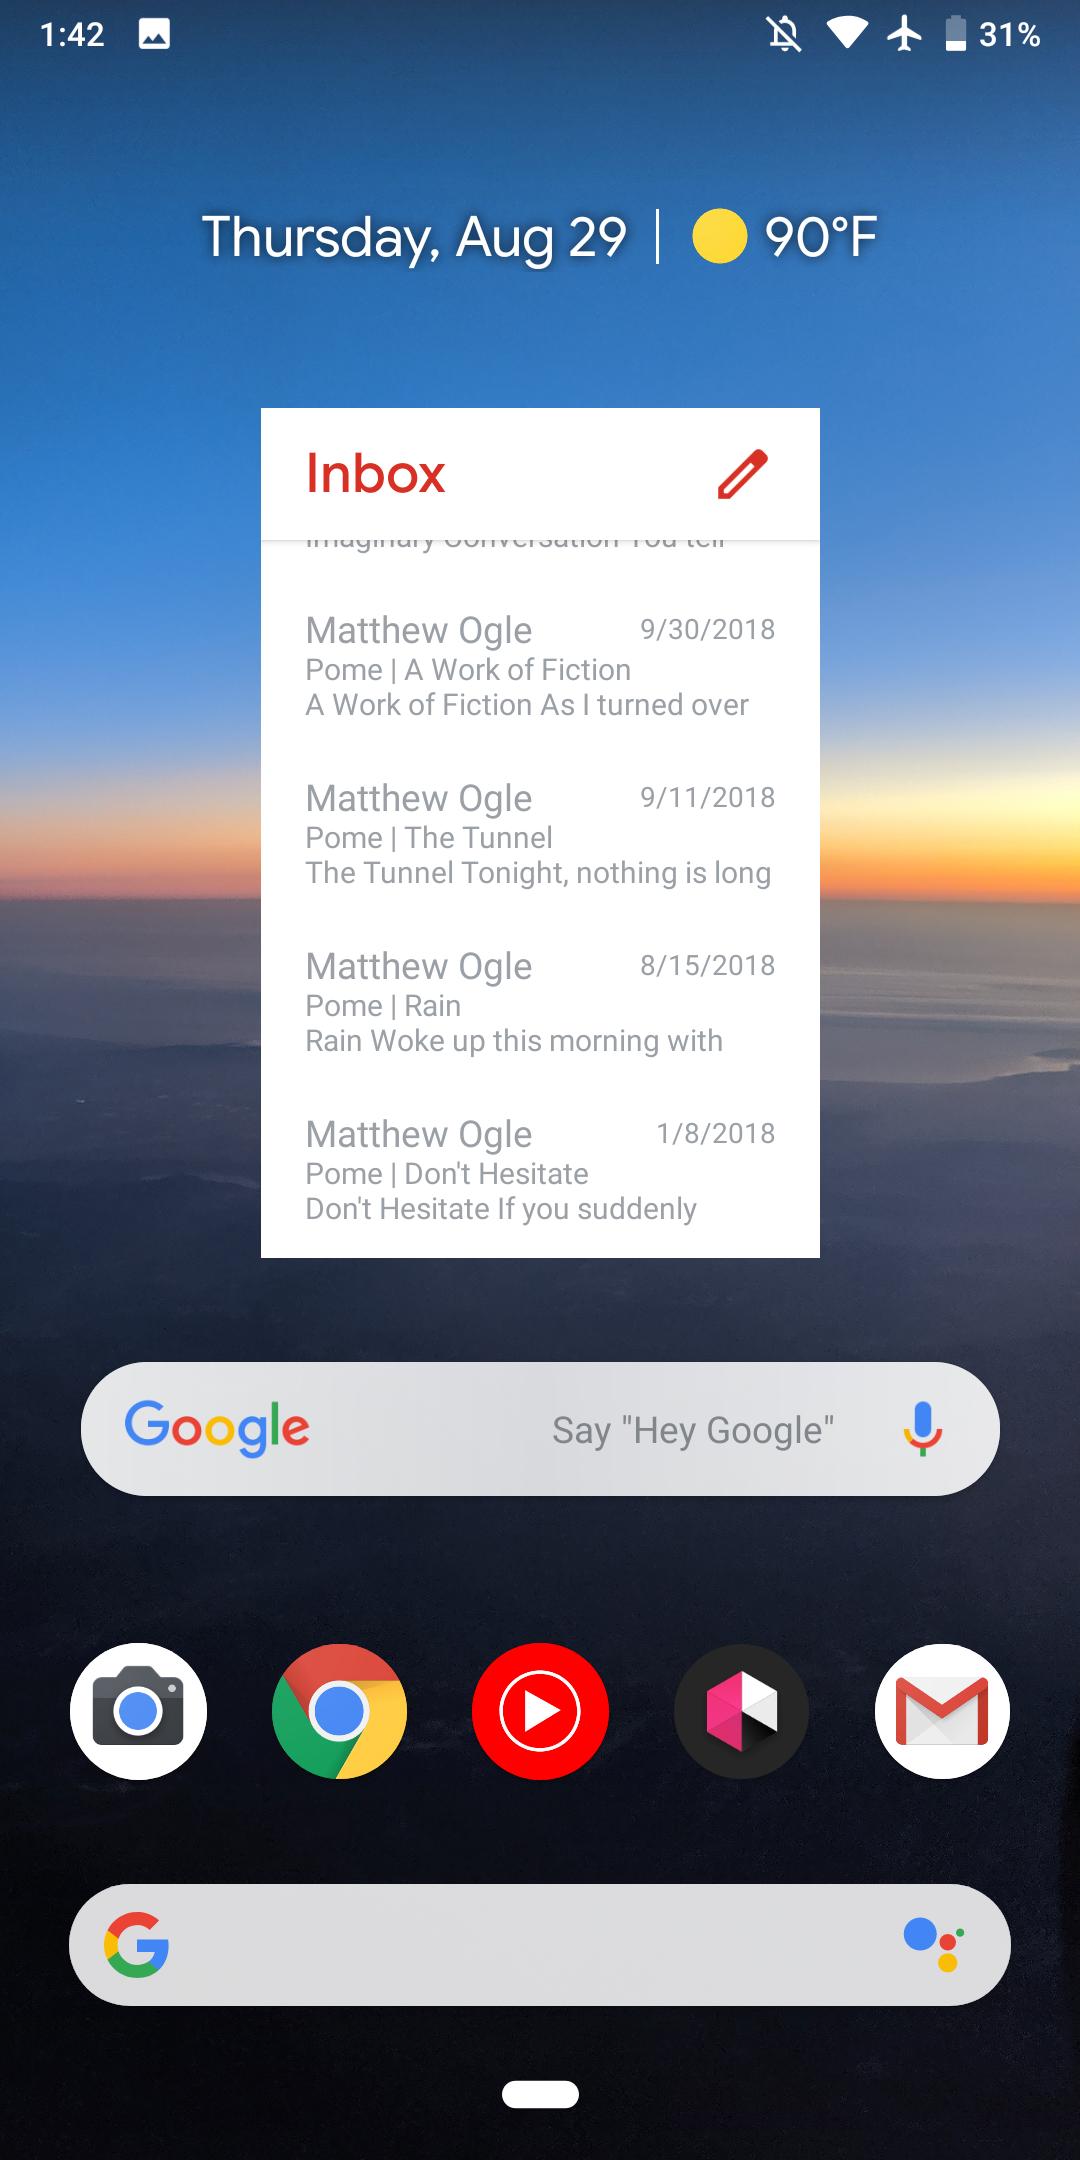 Android gmail widget not updating rozonda thomas dating 2013